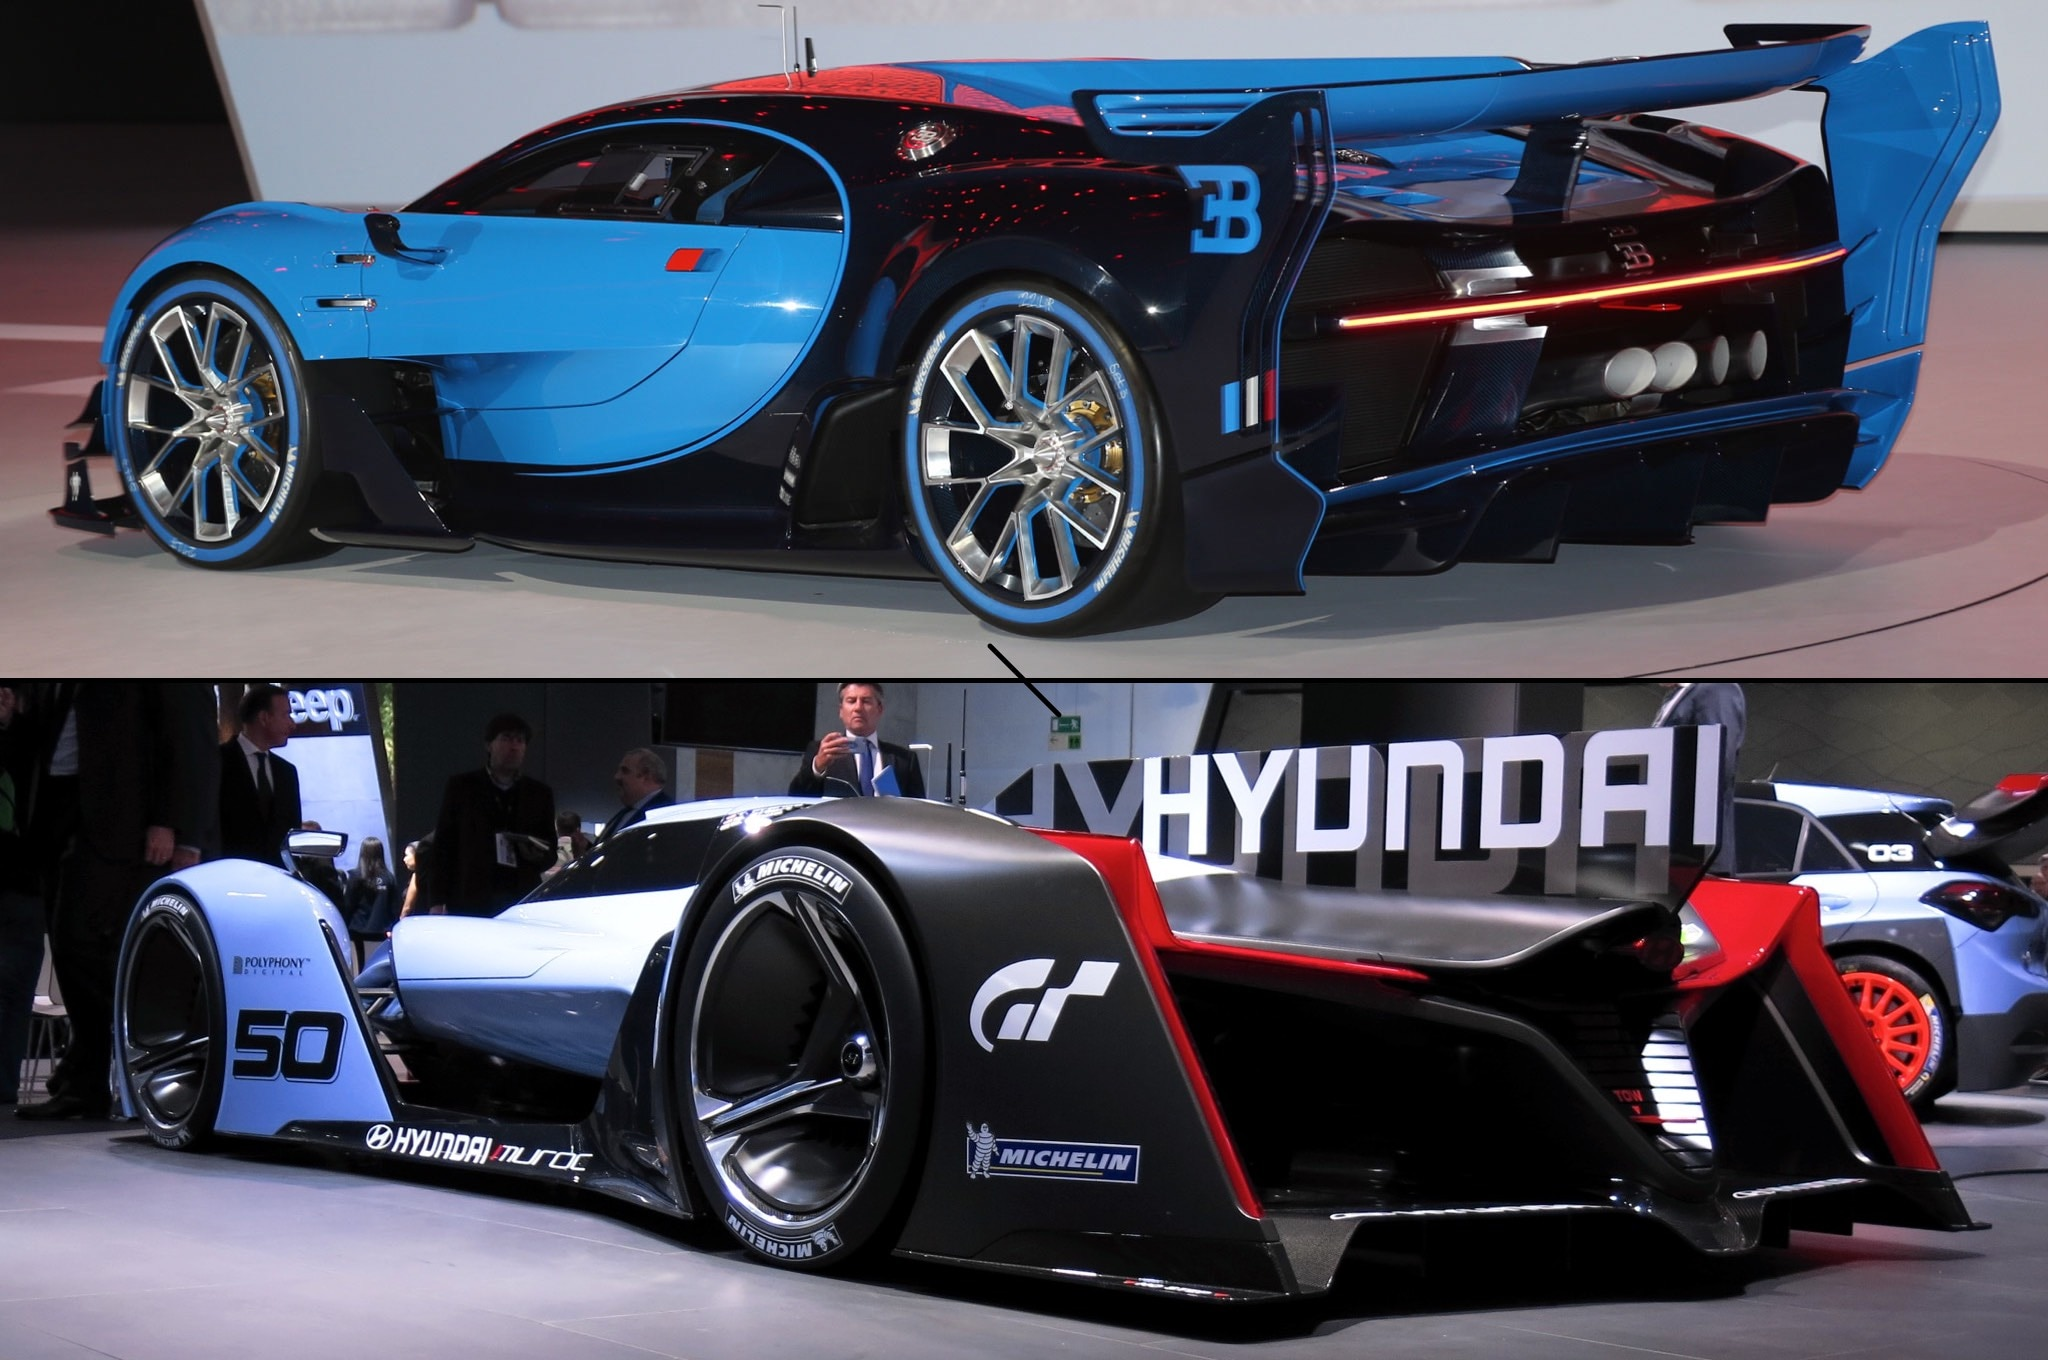 bugatti-hyundai-vision-gran-turismo-rear-pair Fascinating Gran Turismo Psp Bugatti Veyron Price Cars Trend